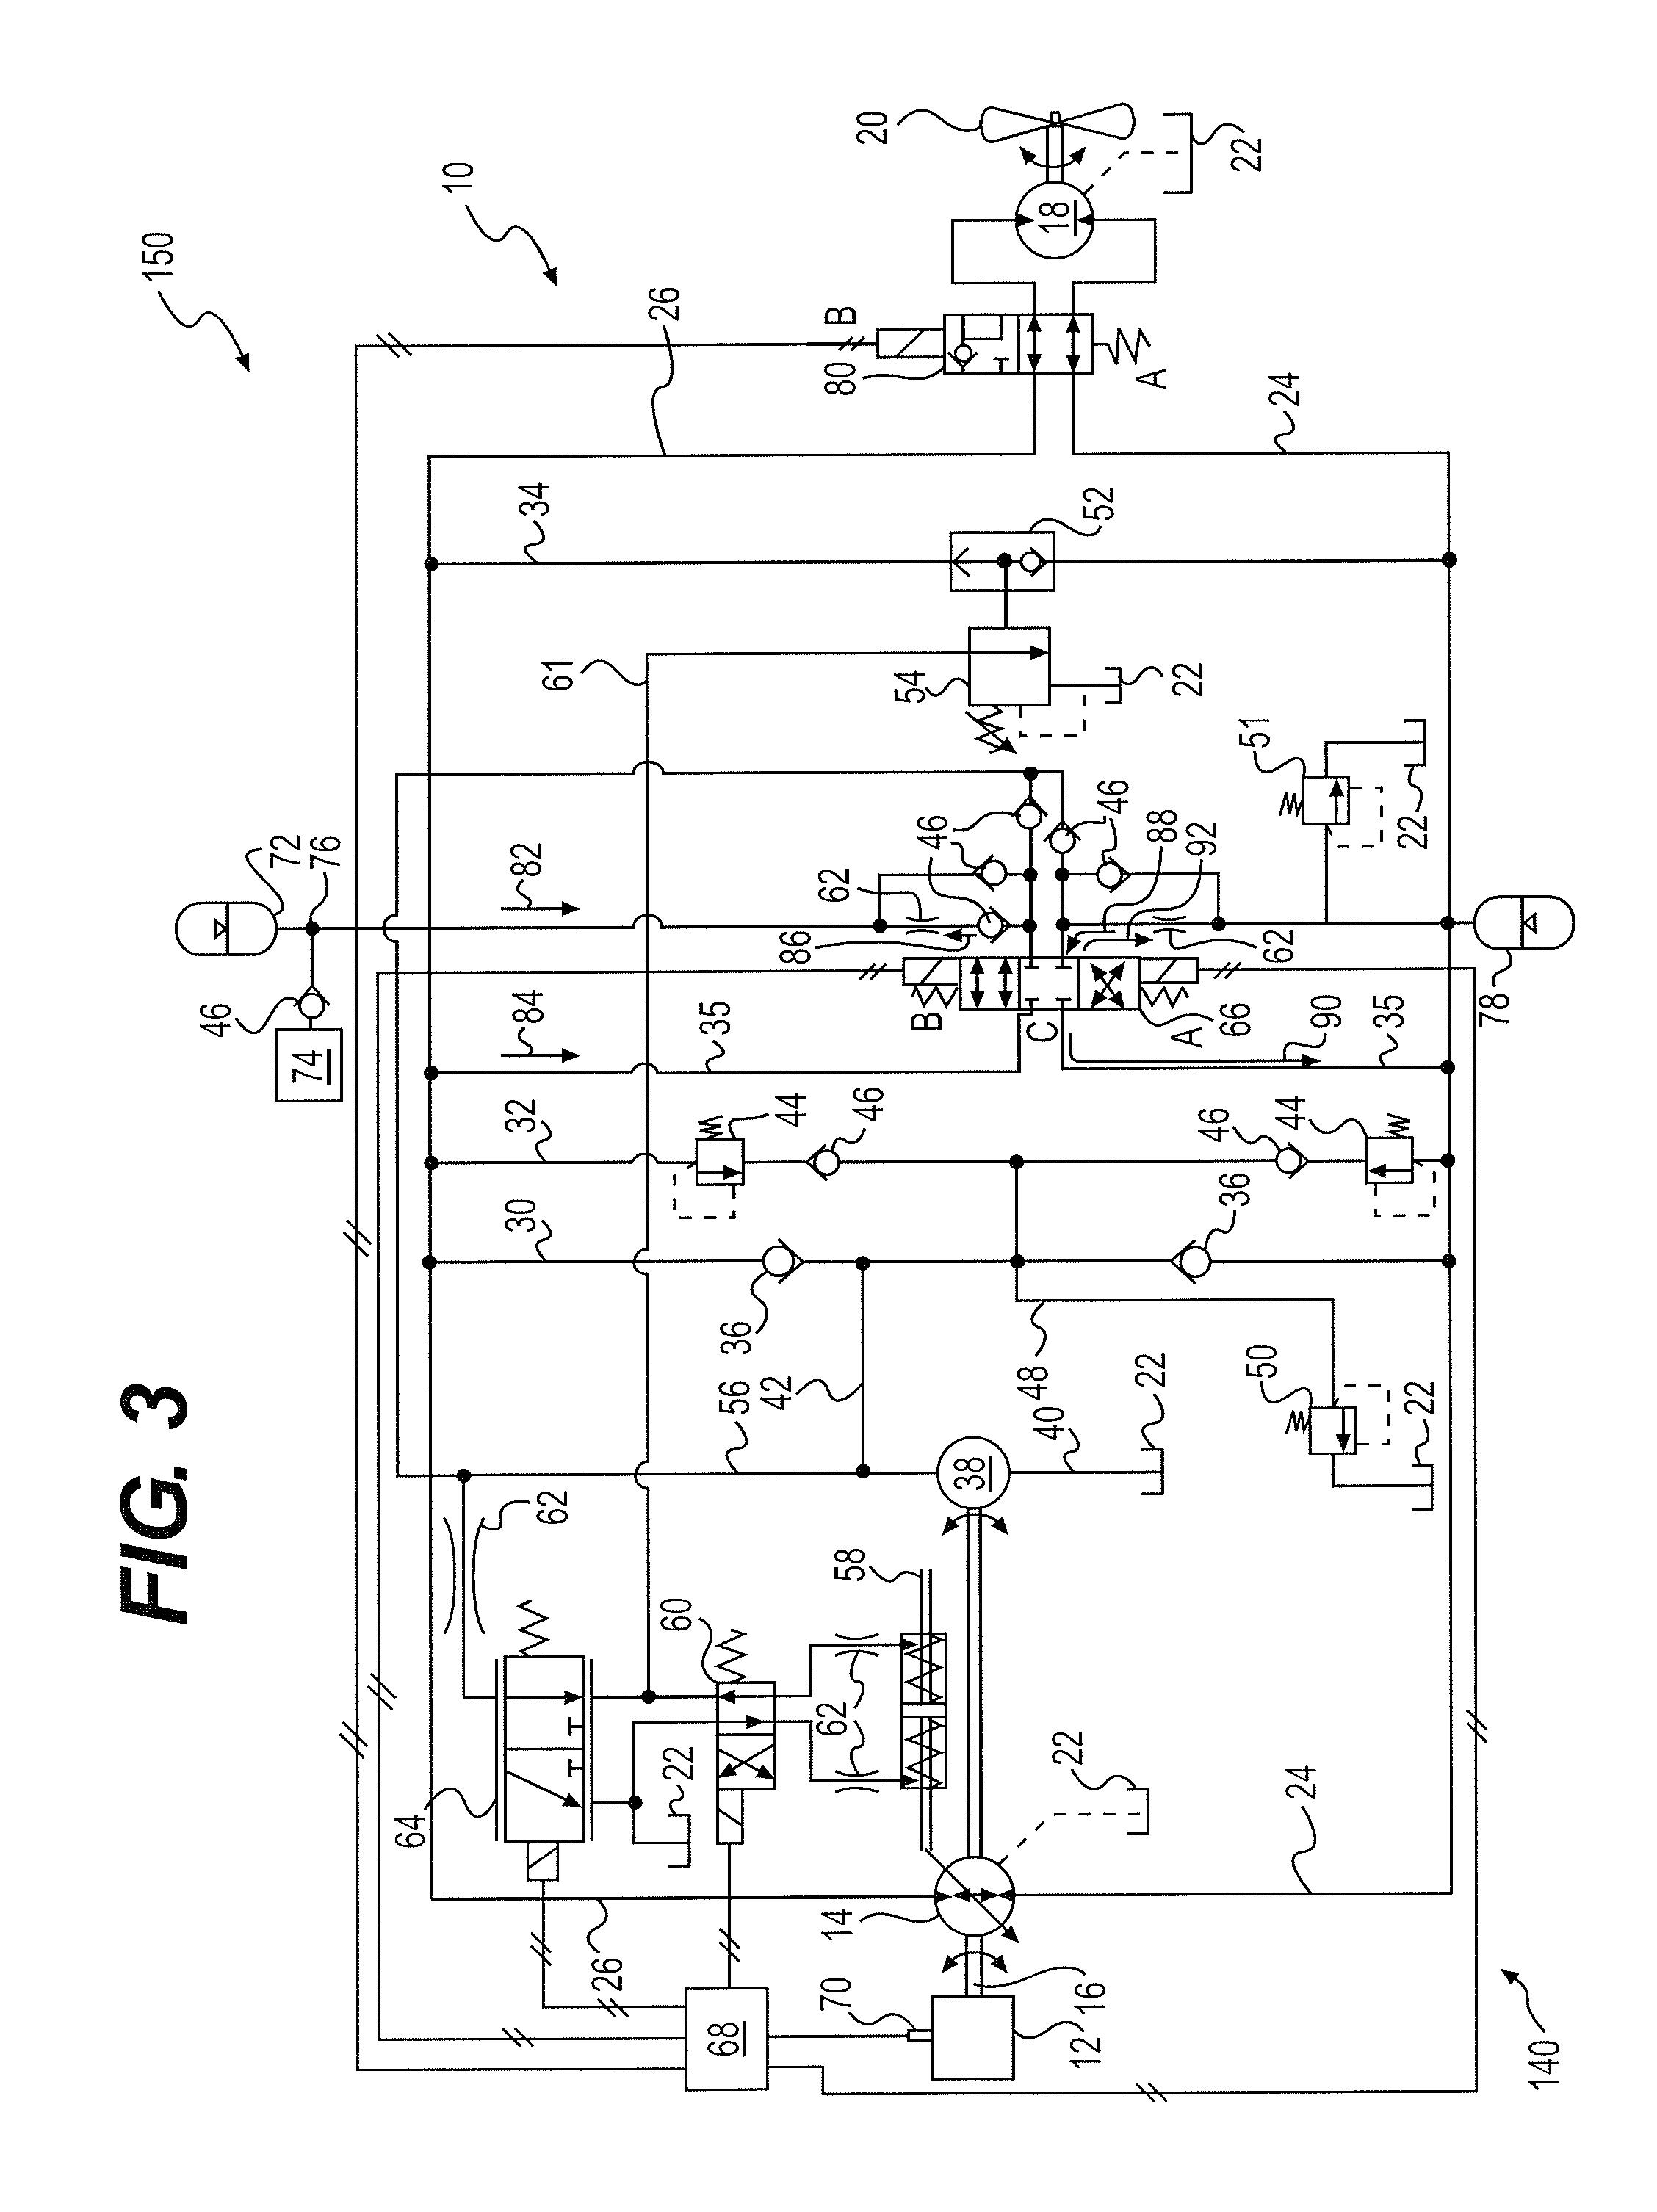 patent us20120304631 - hydraulic fluid system